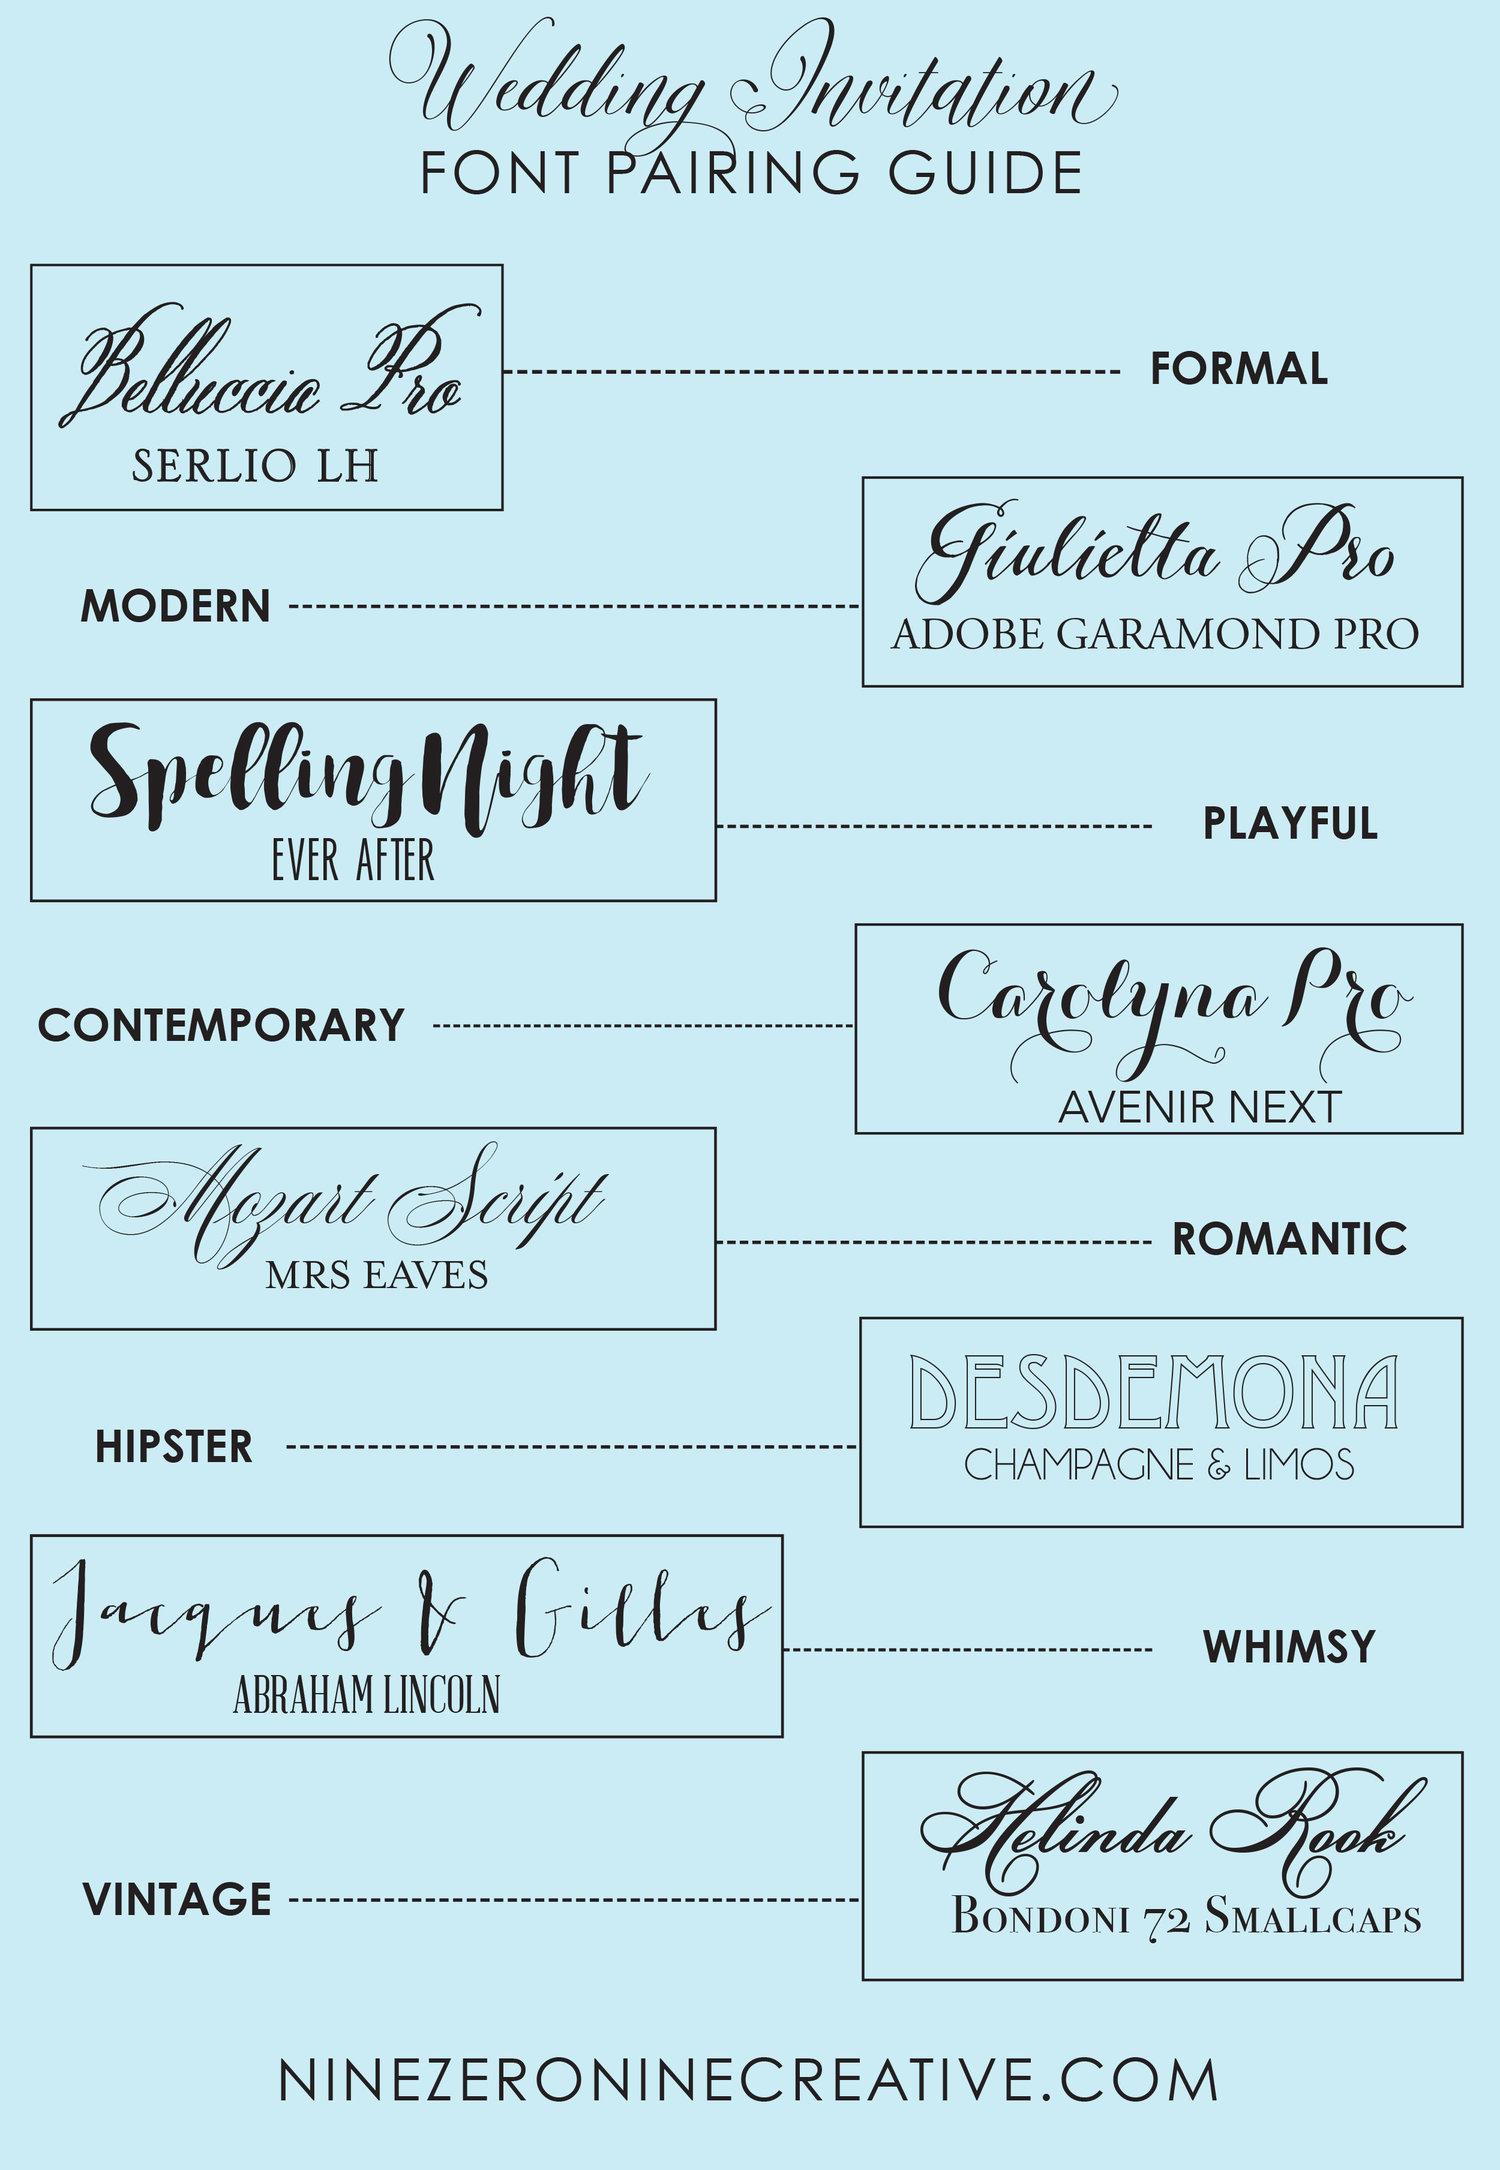 Top 8 Font Pairings for Wedding Invitations — nine0nine creative   custom  invitations